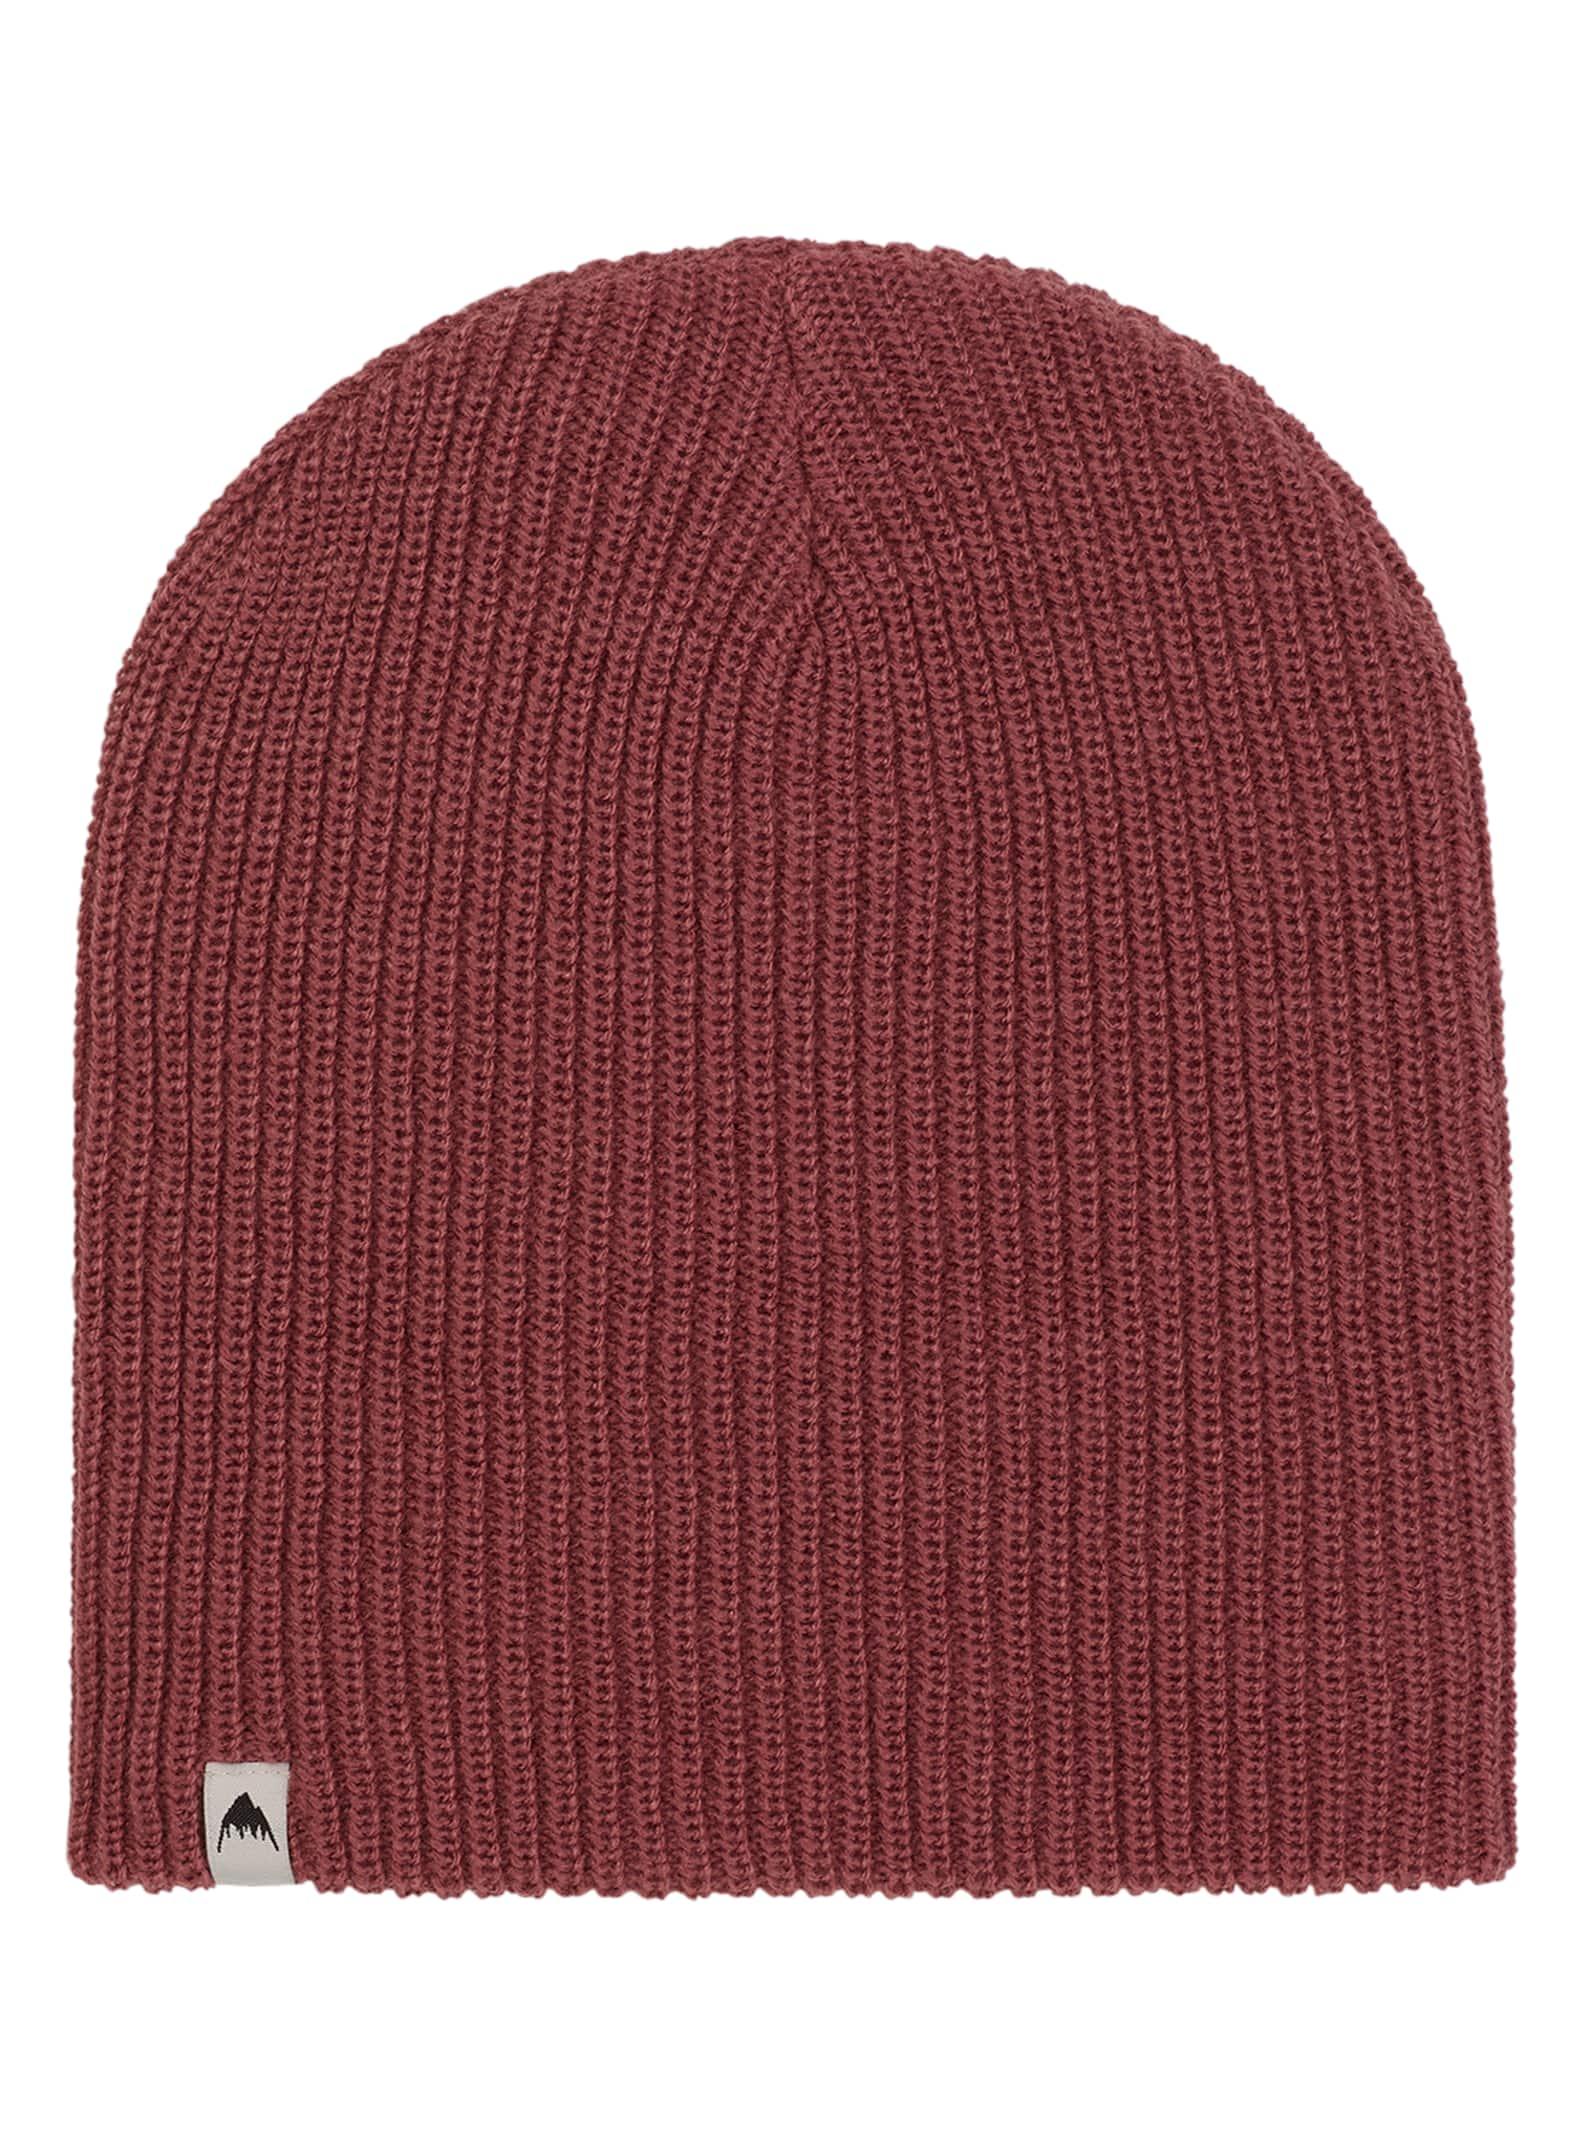 33b5eaef434f Men's Hats & Beanies | Burton Snowboards